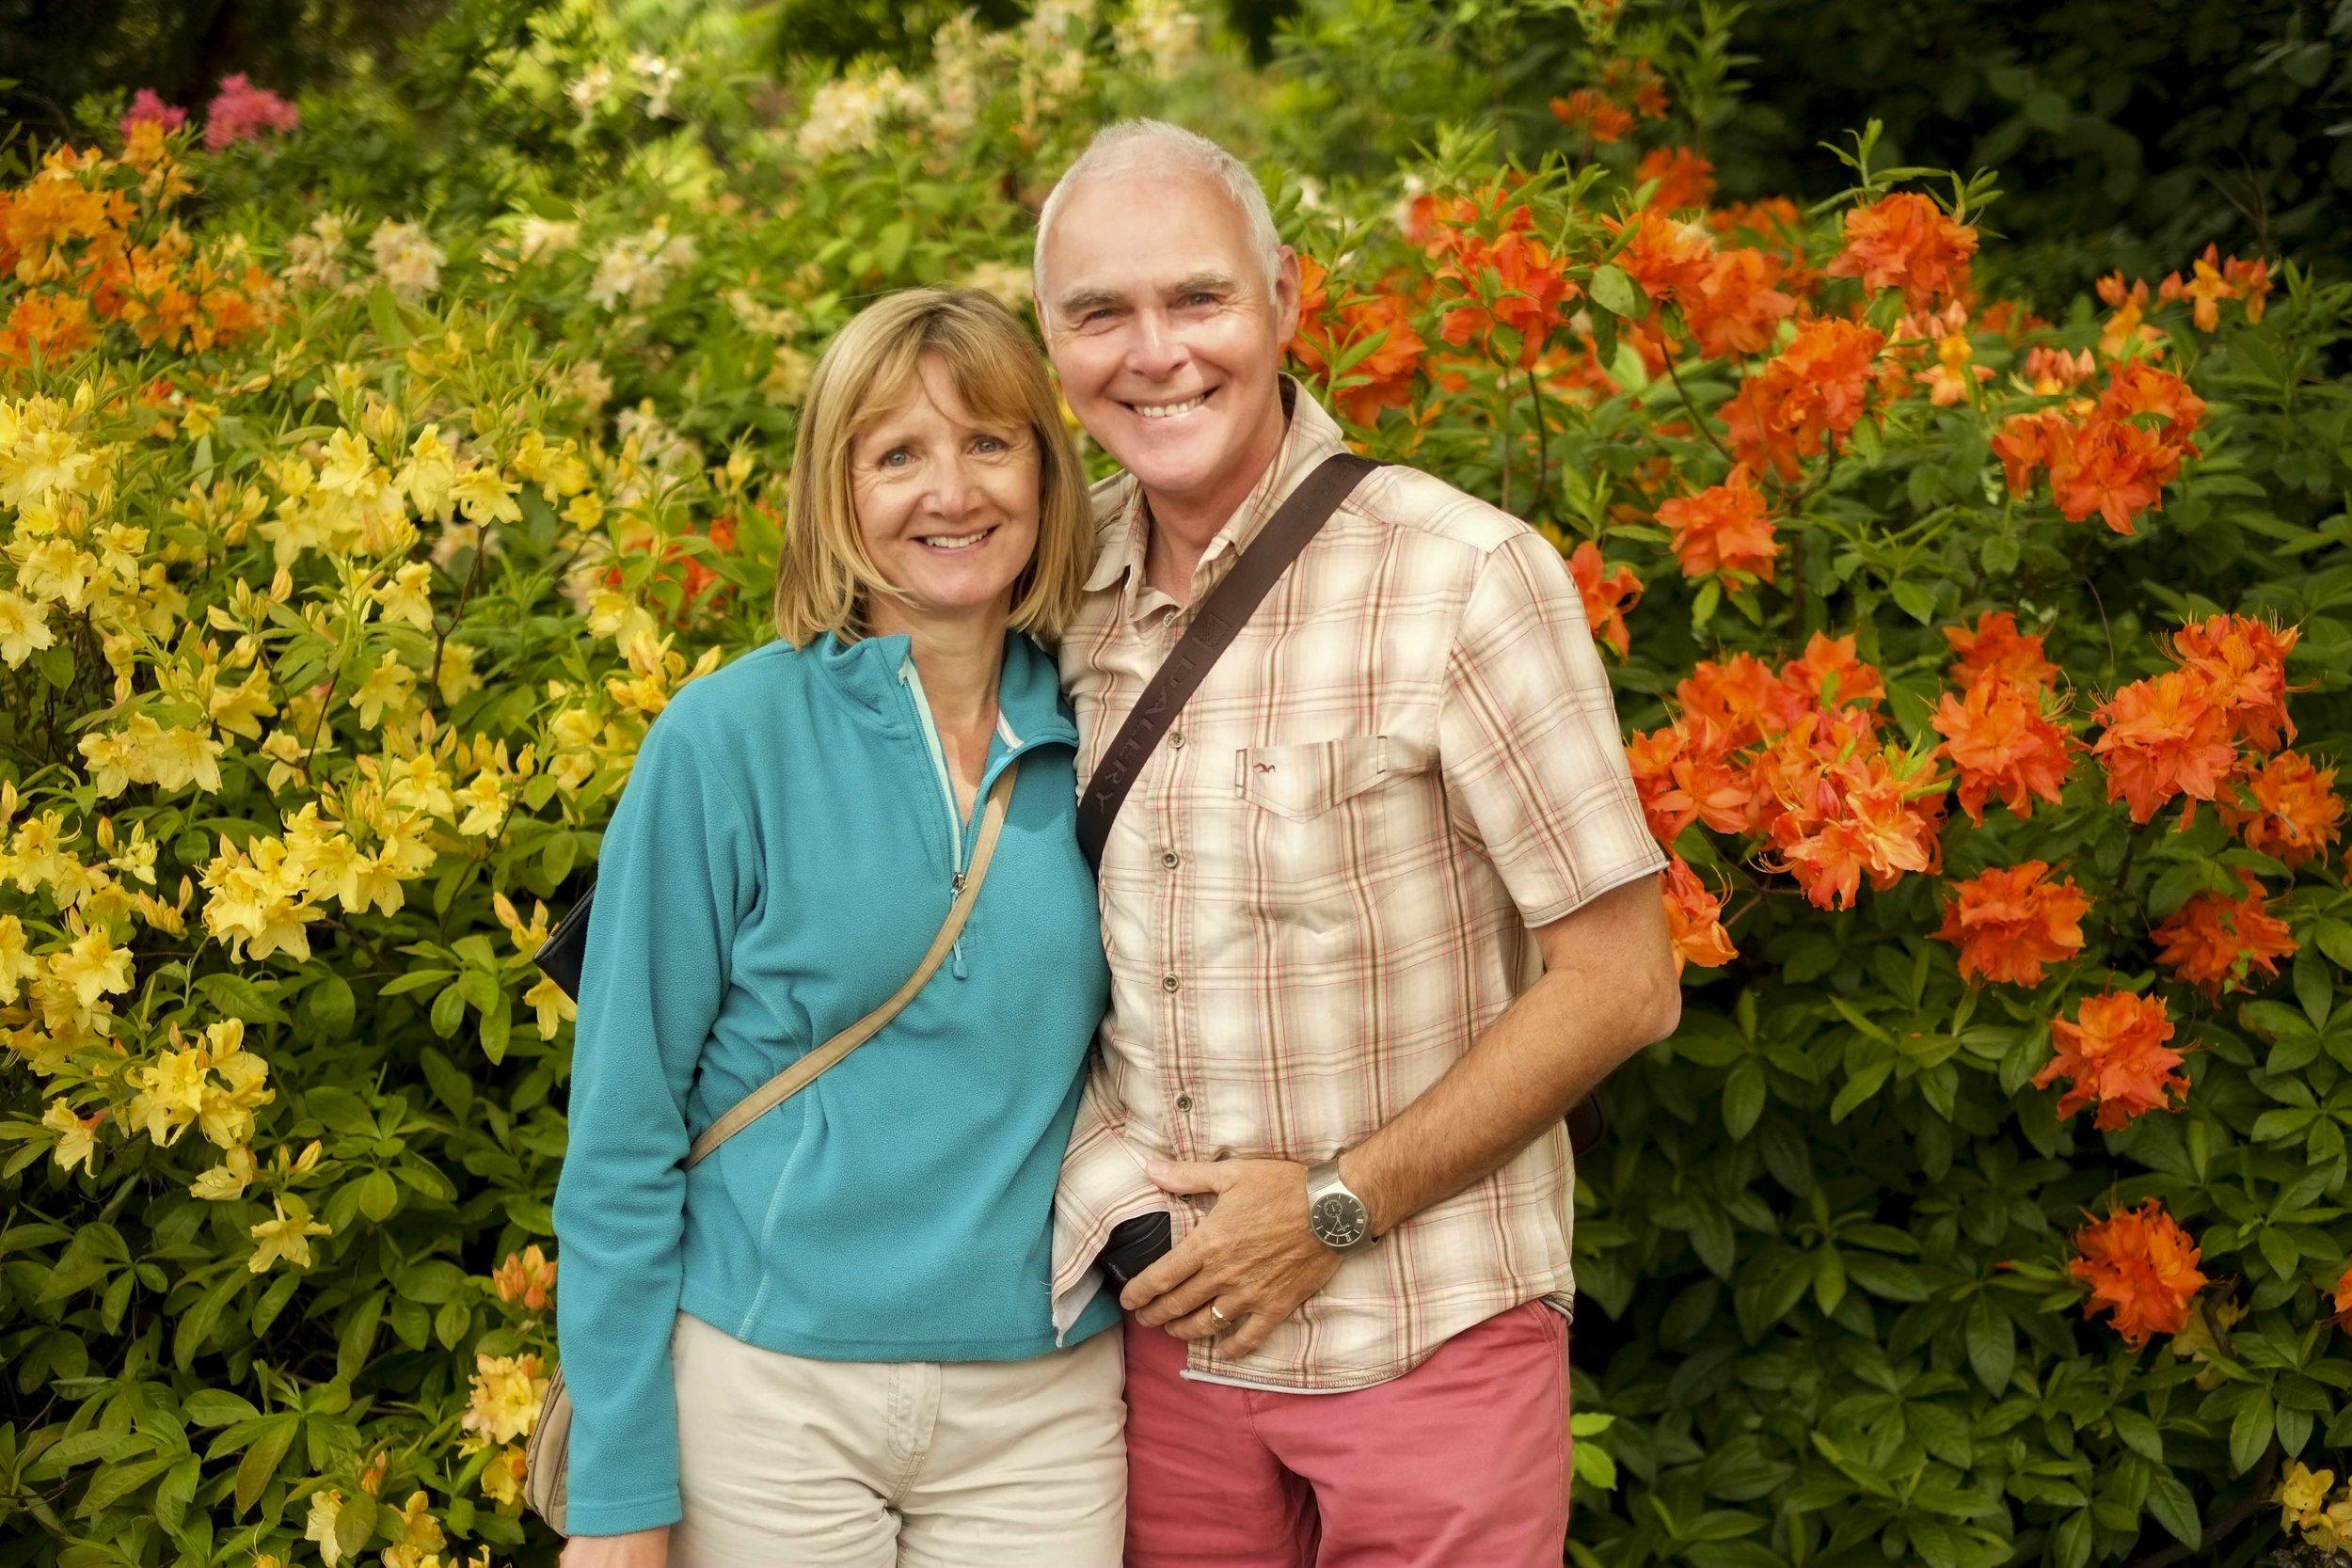 Commercial Photography Dunedin - Travel & Tourism